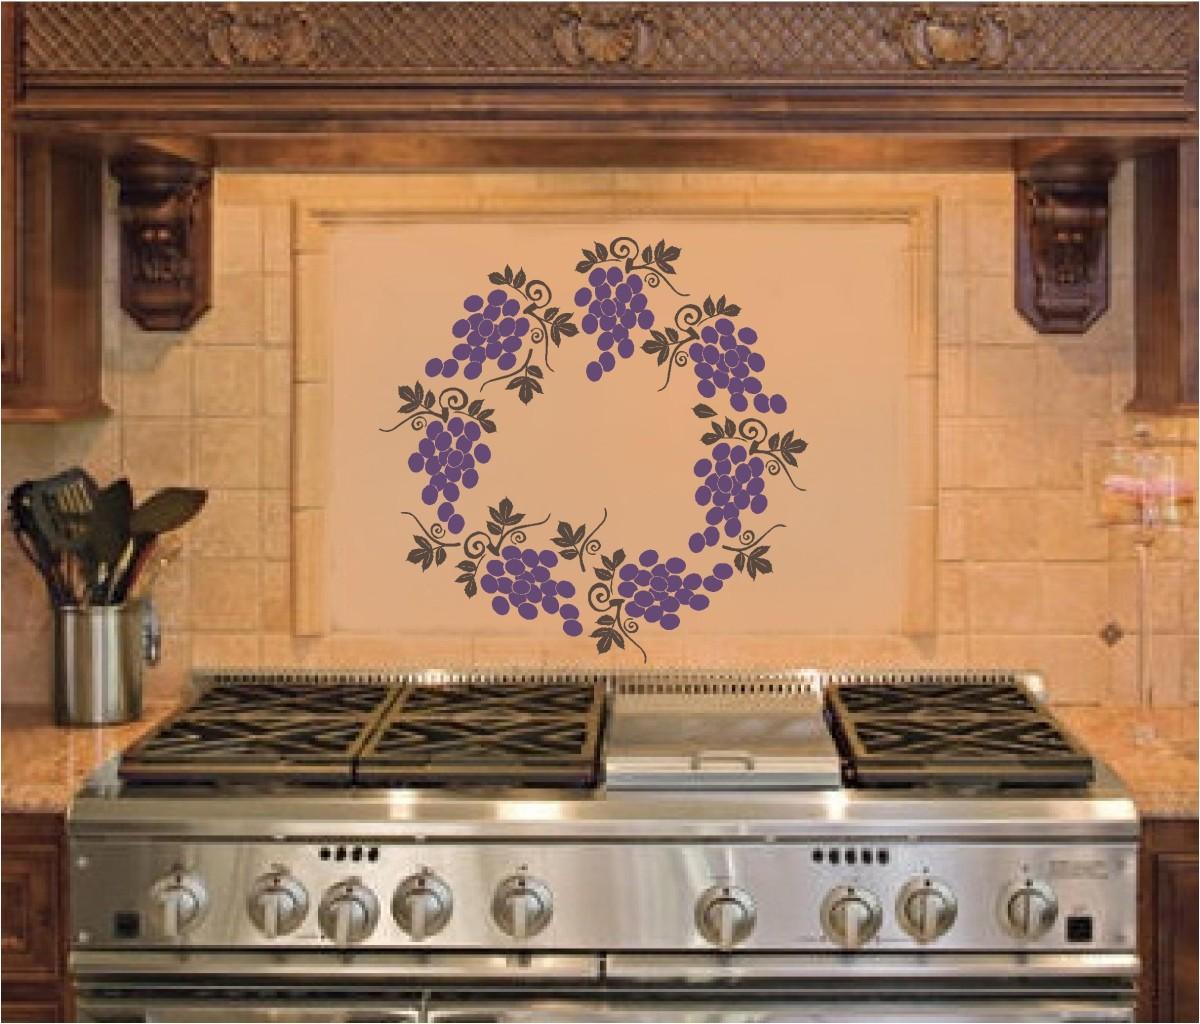 Grape Wreath Kitchen Wall Stickers Vinyl Decal Decor Ebay